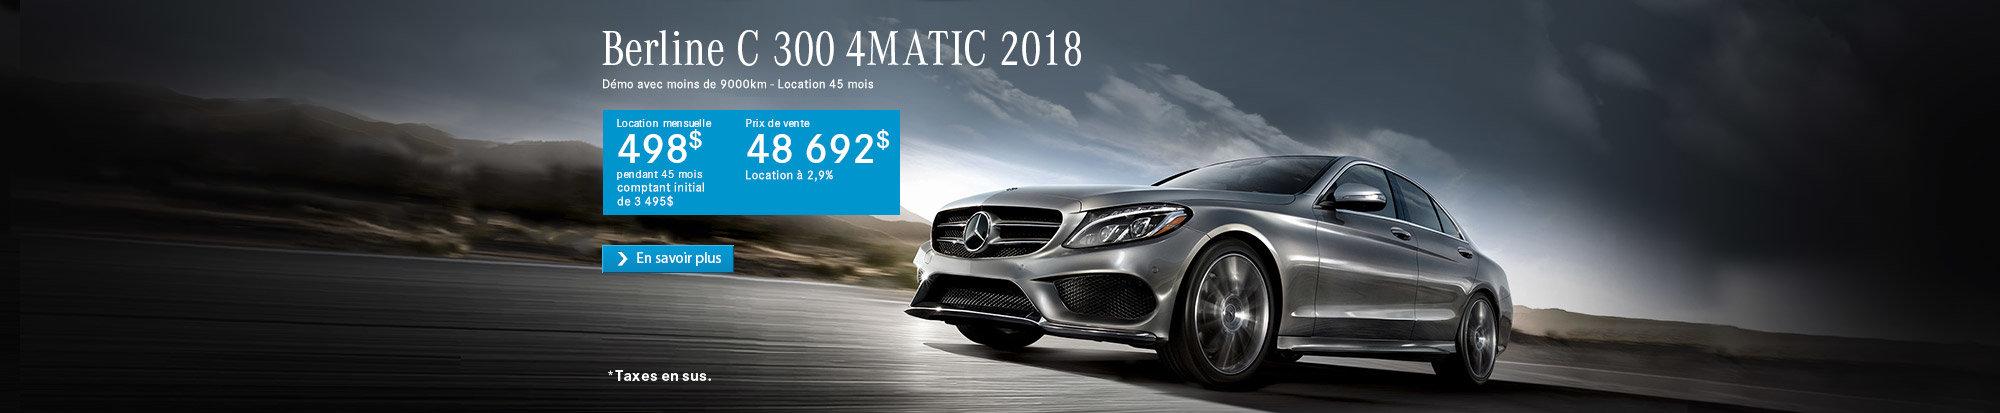 Classe C 300 2018 - web